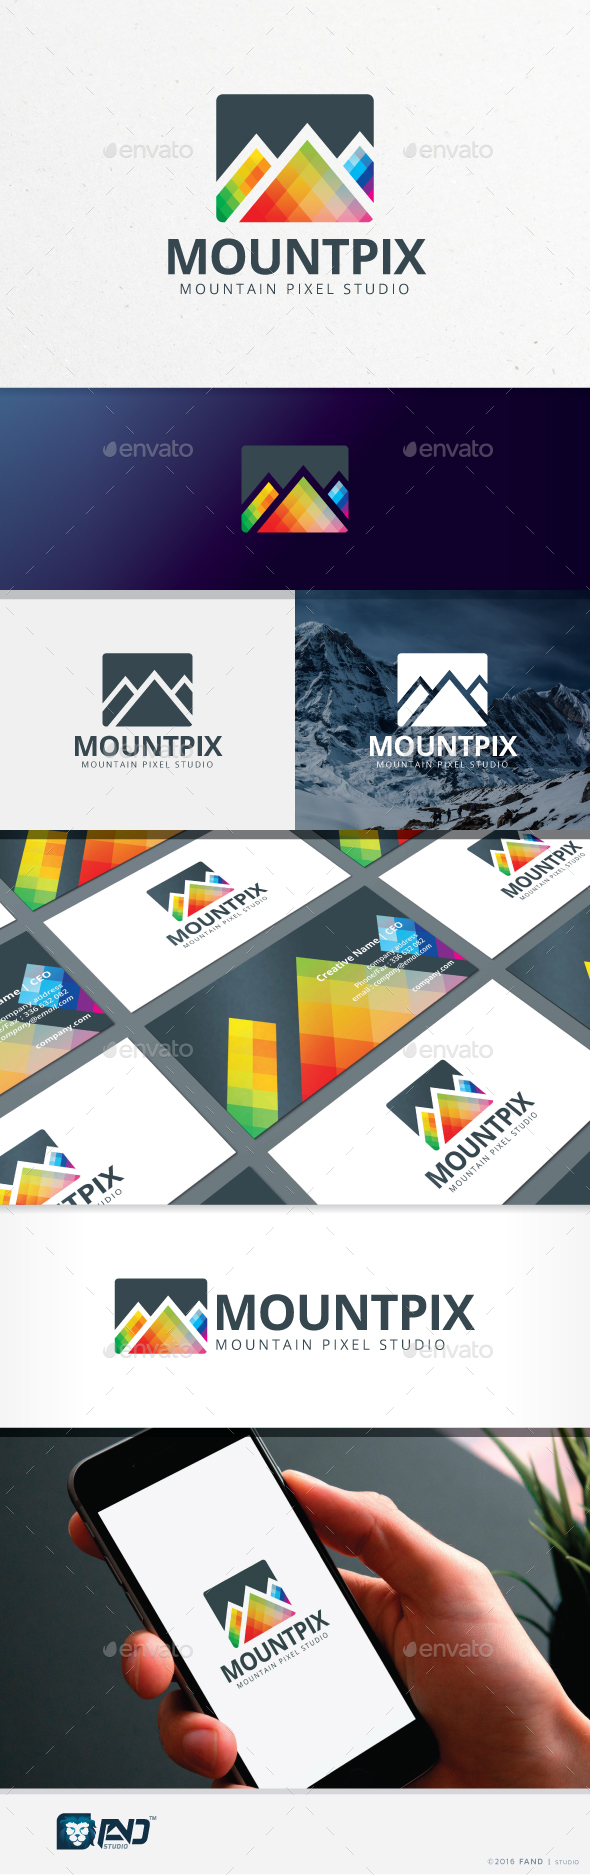 Mountain Pixel